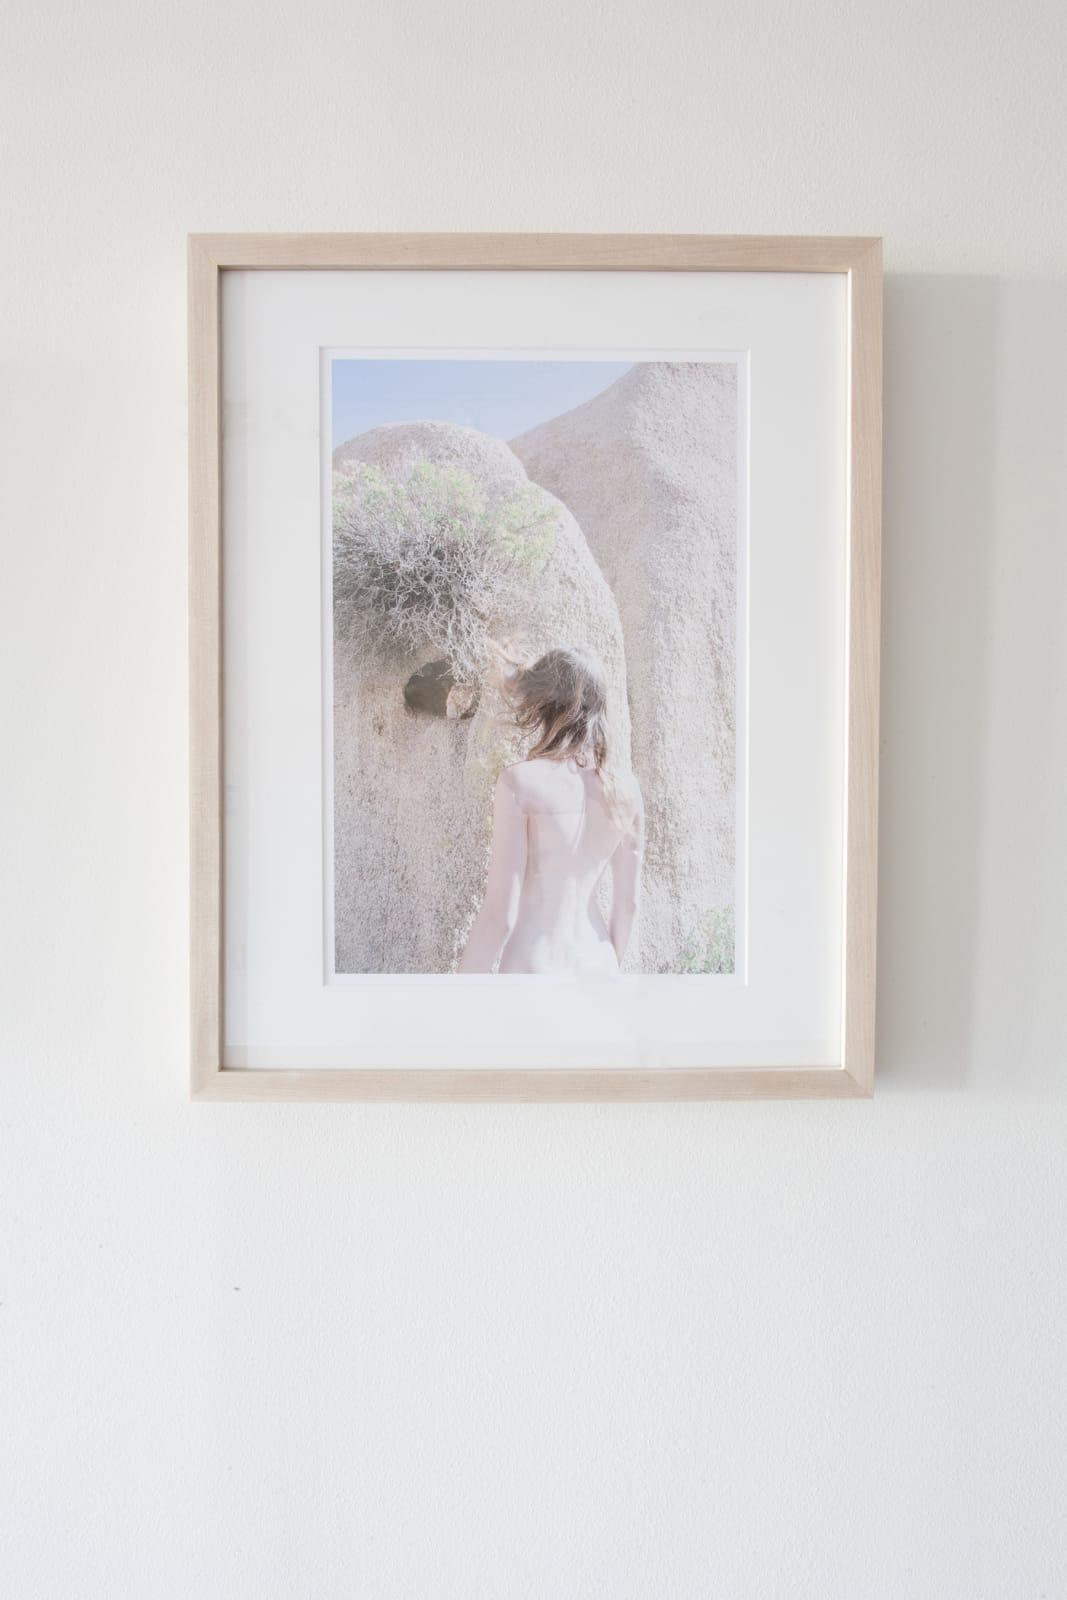 Grace Clark Jumbo Rocks III, 2017 digital pigment print print size 15 x 10 inches, 20 x 16 framed, edition 1/10 $ 650.00